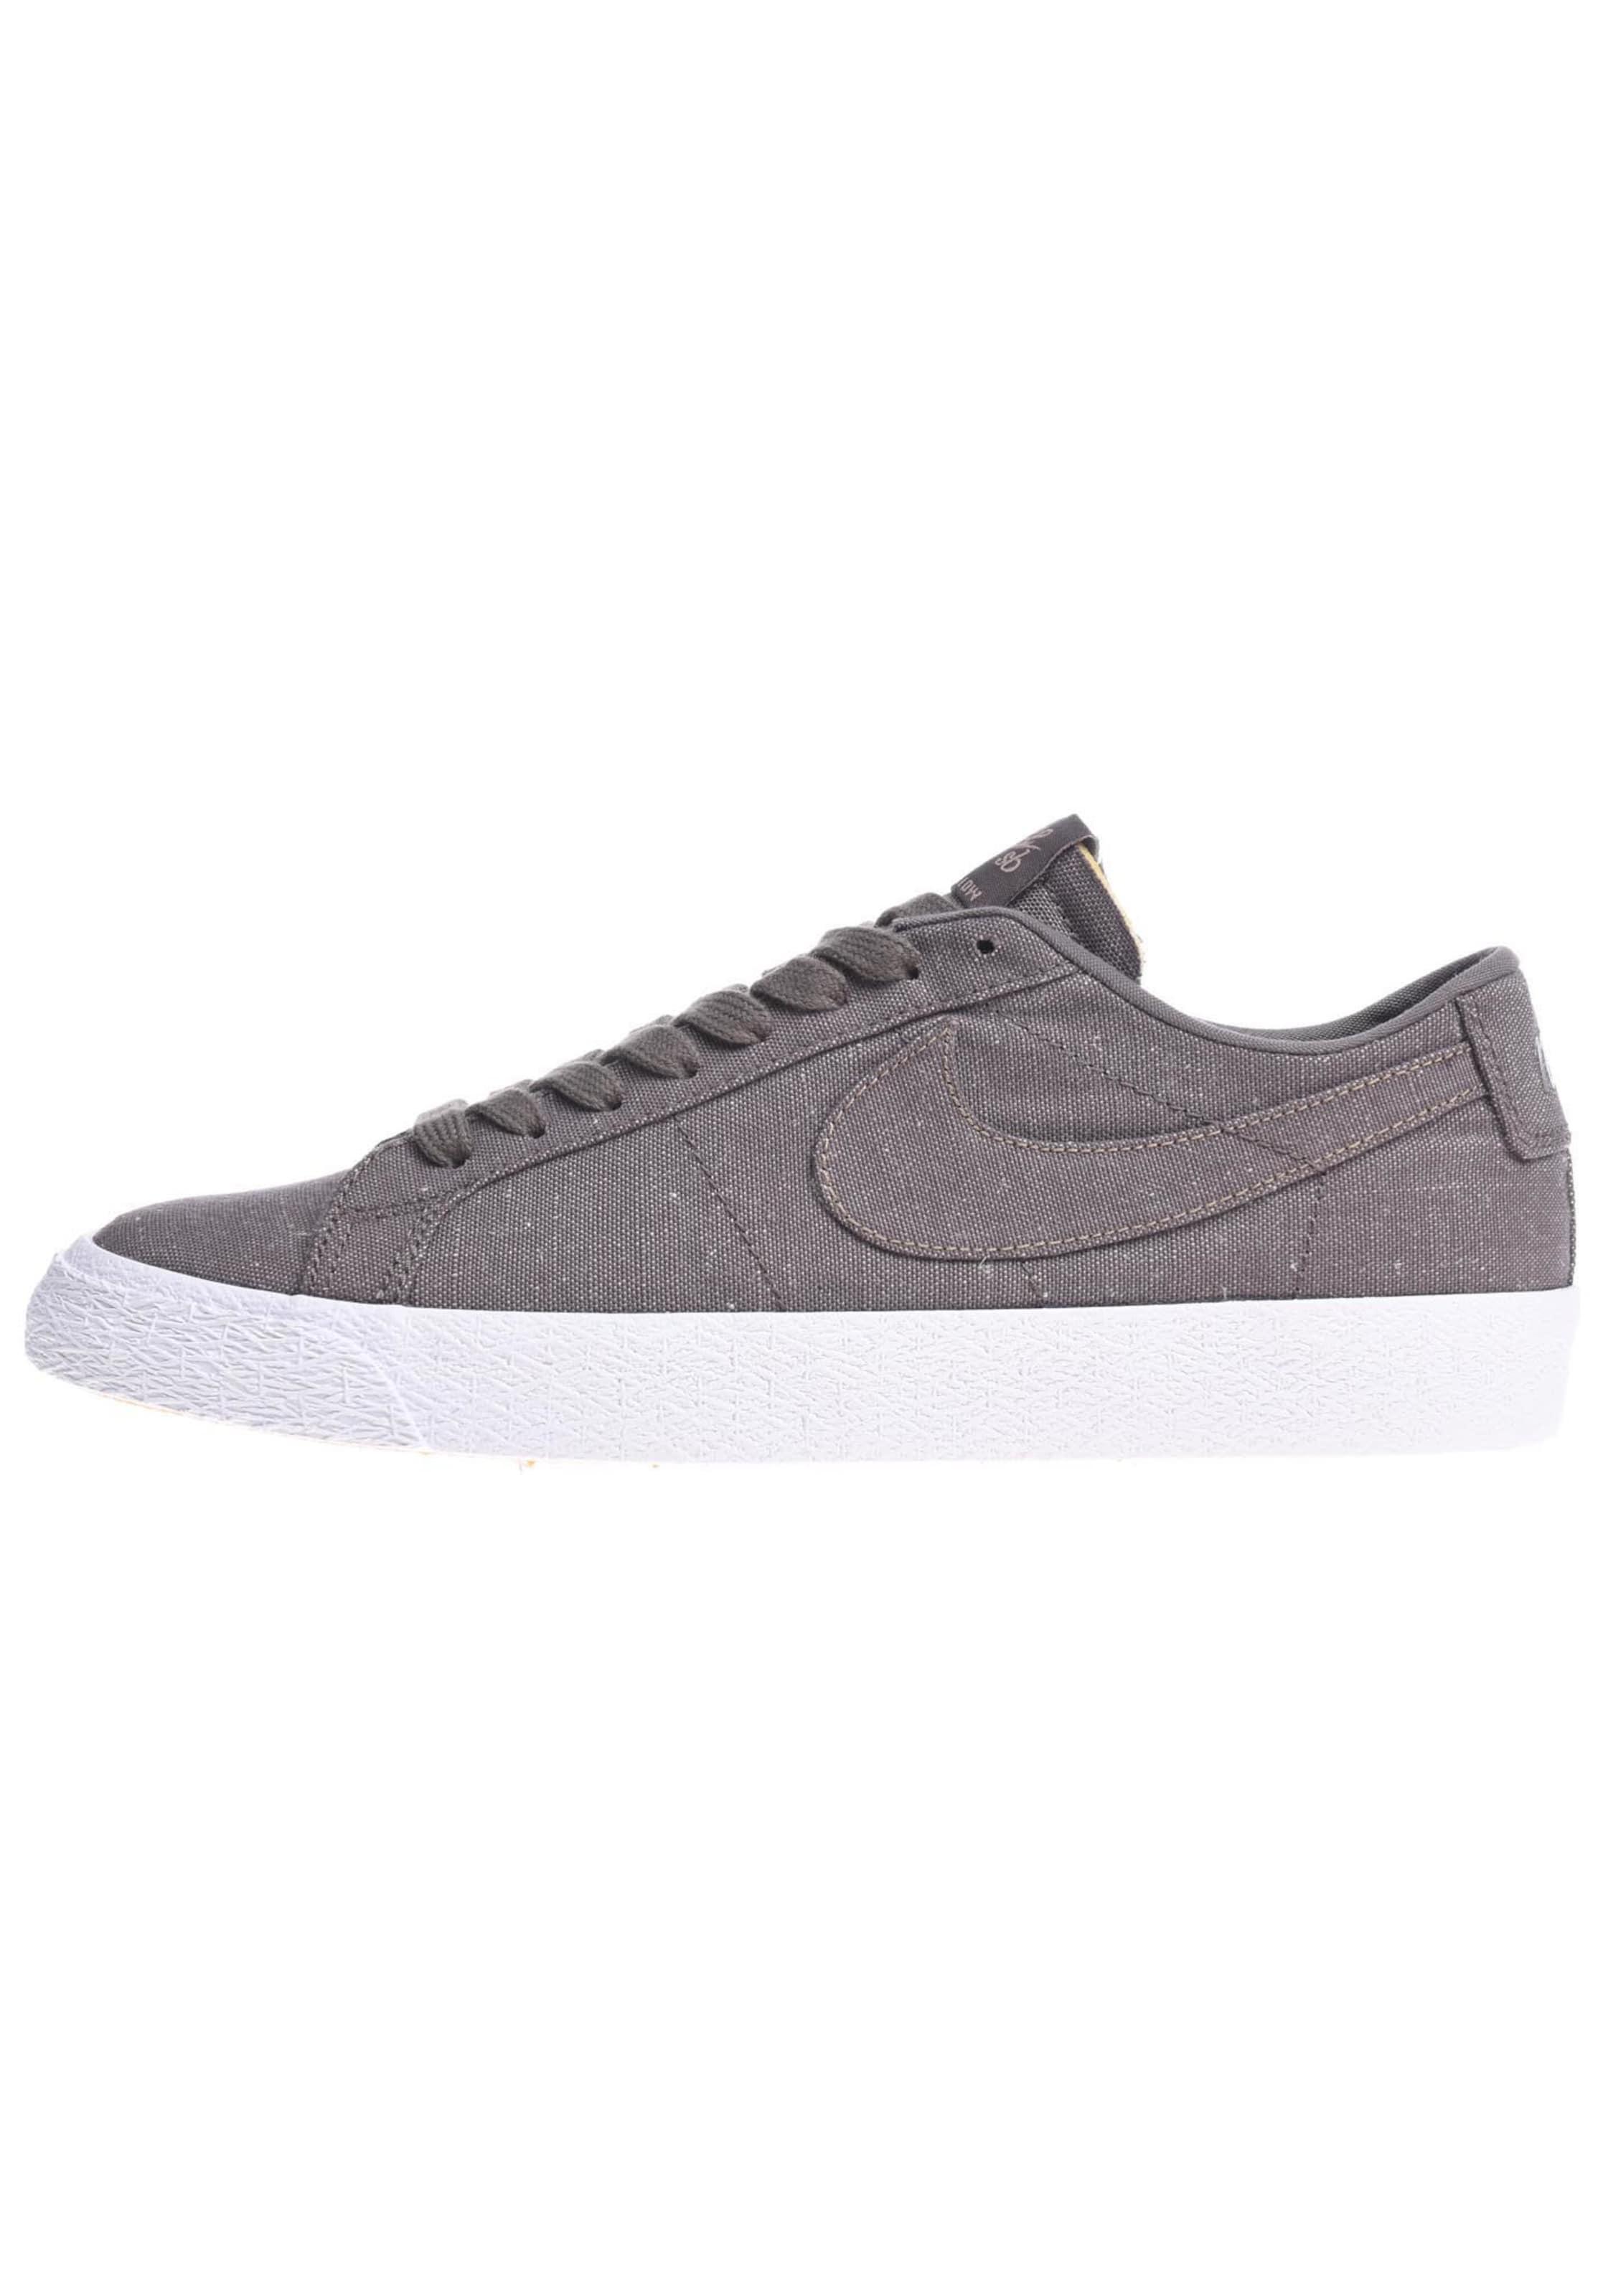 Nike SB Zoom Blazer Low Canvas Decon Sneaker